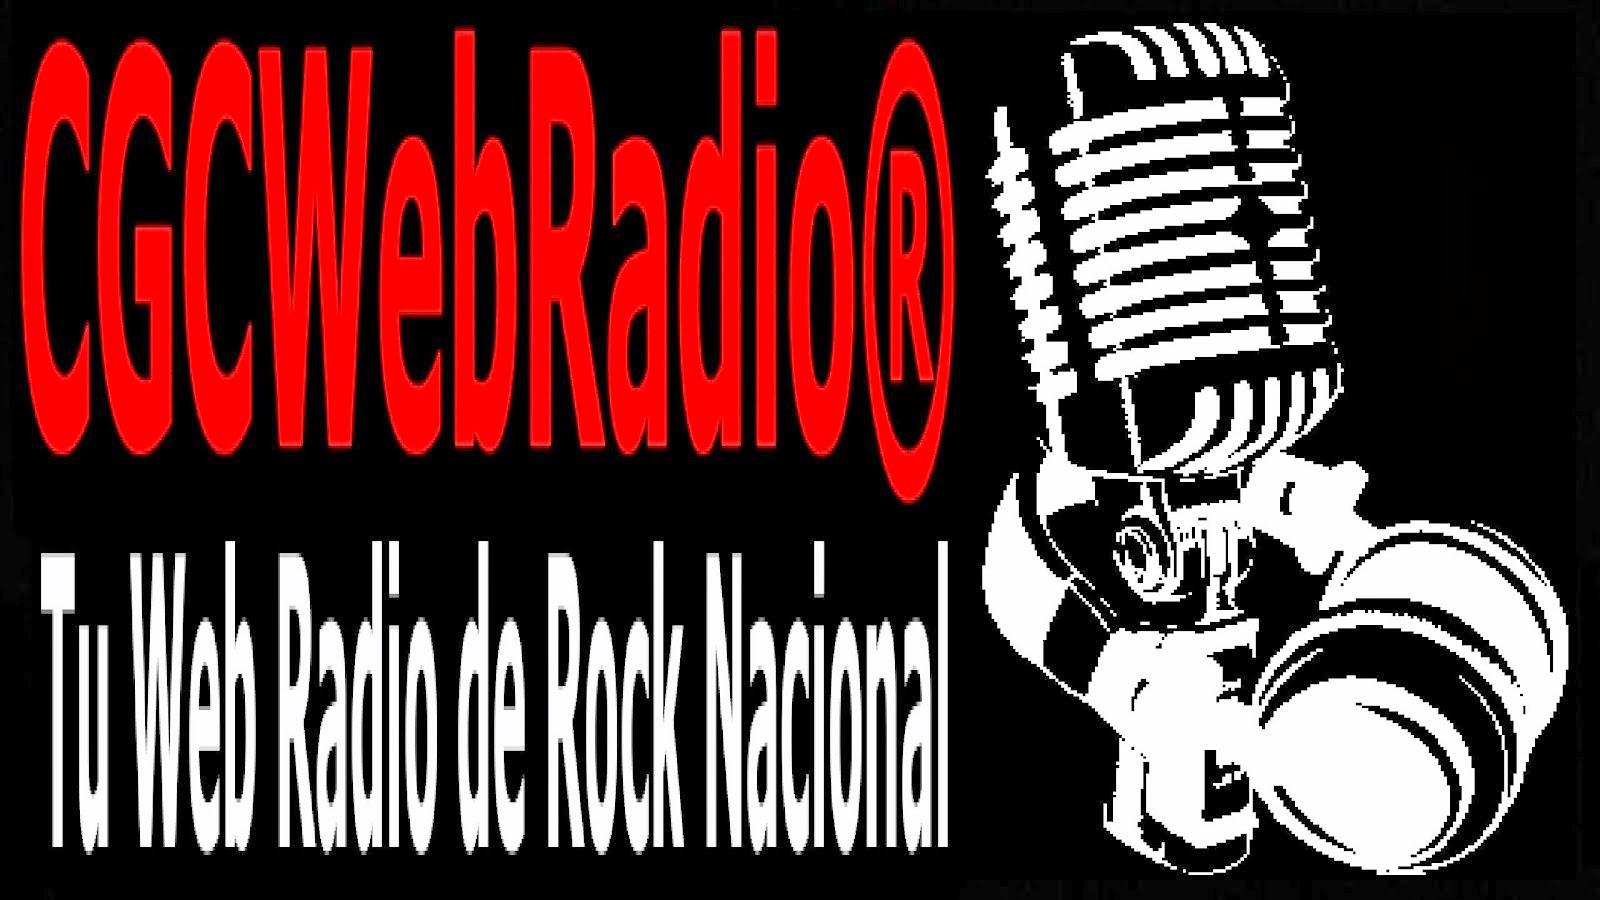 CGCWebRadioArgentina®